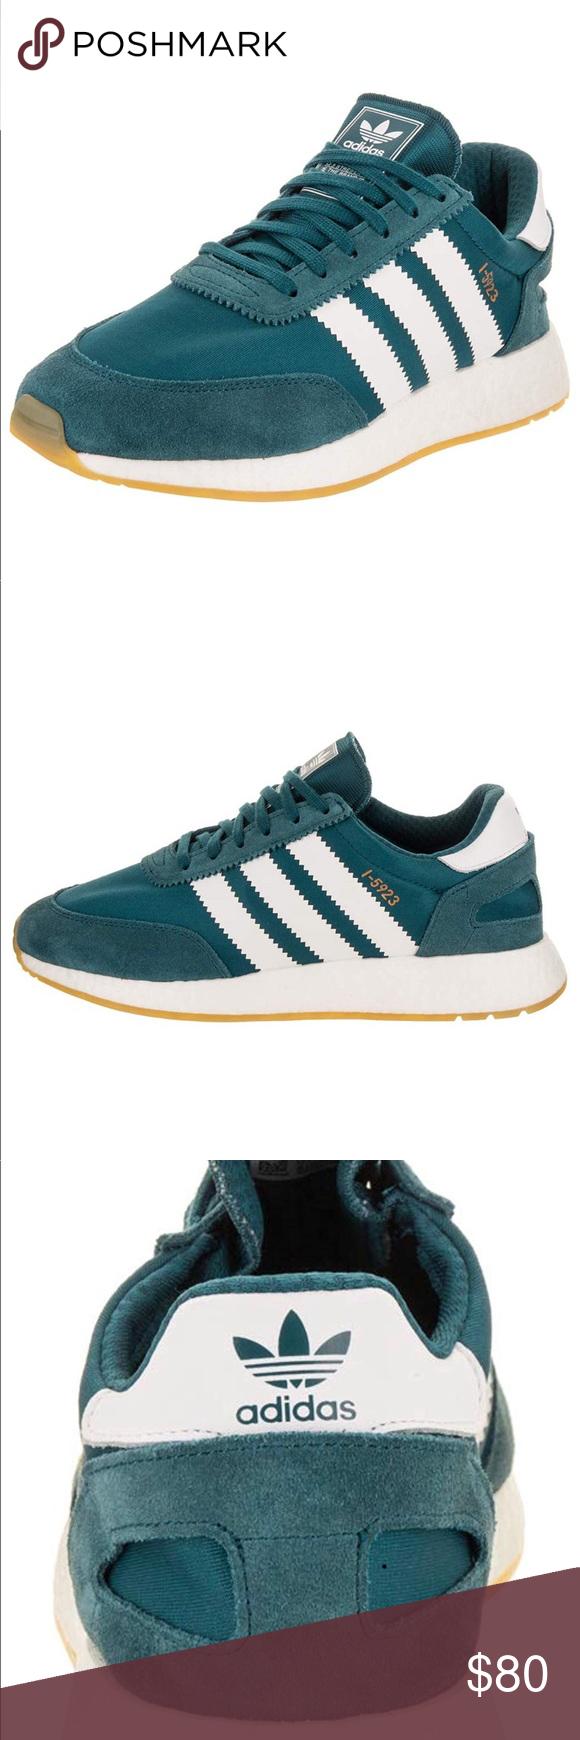 "Adidas ""iniki"" teal I-5923 runner"